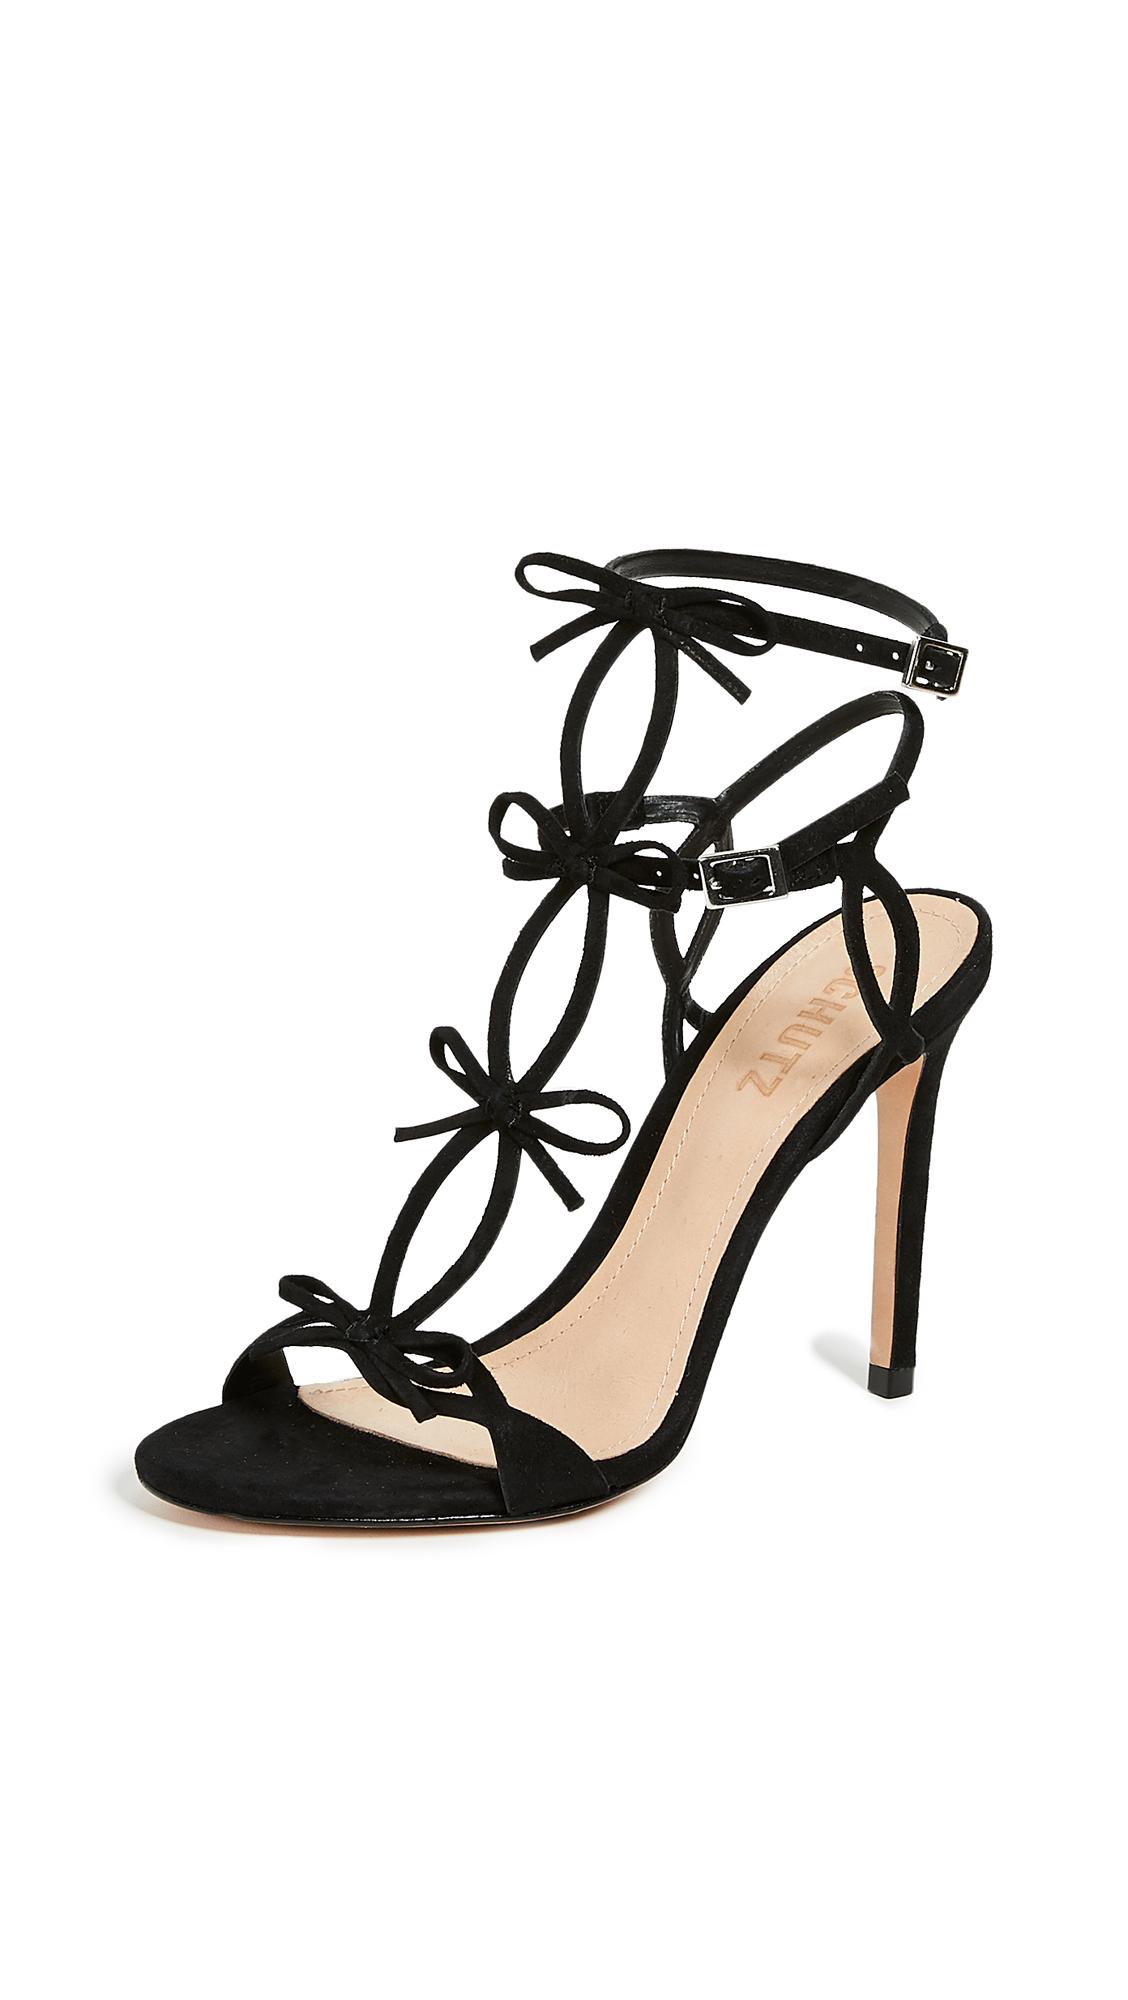 Schutz Moah Strappy Sandals - Black